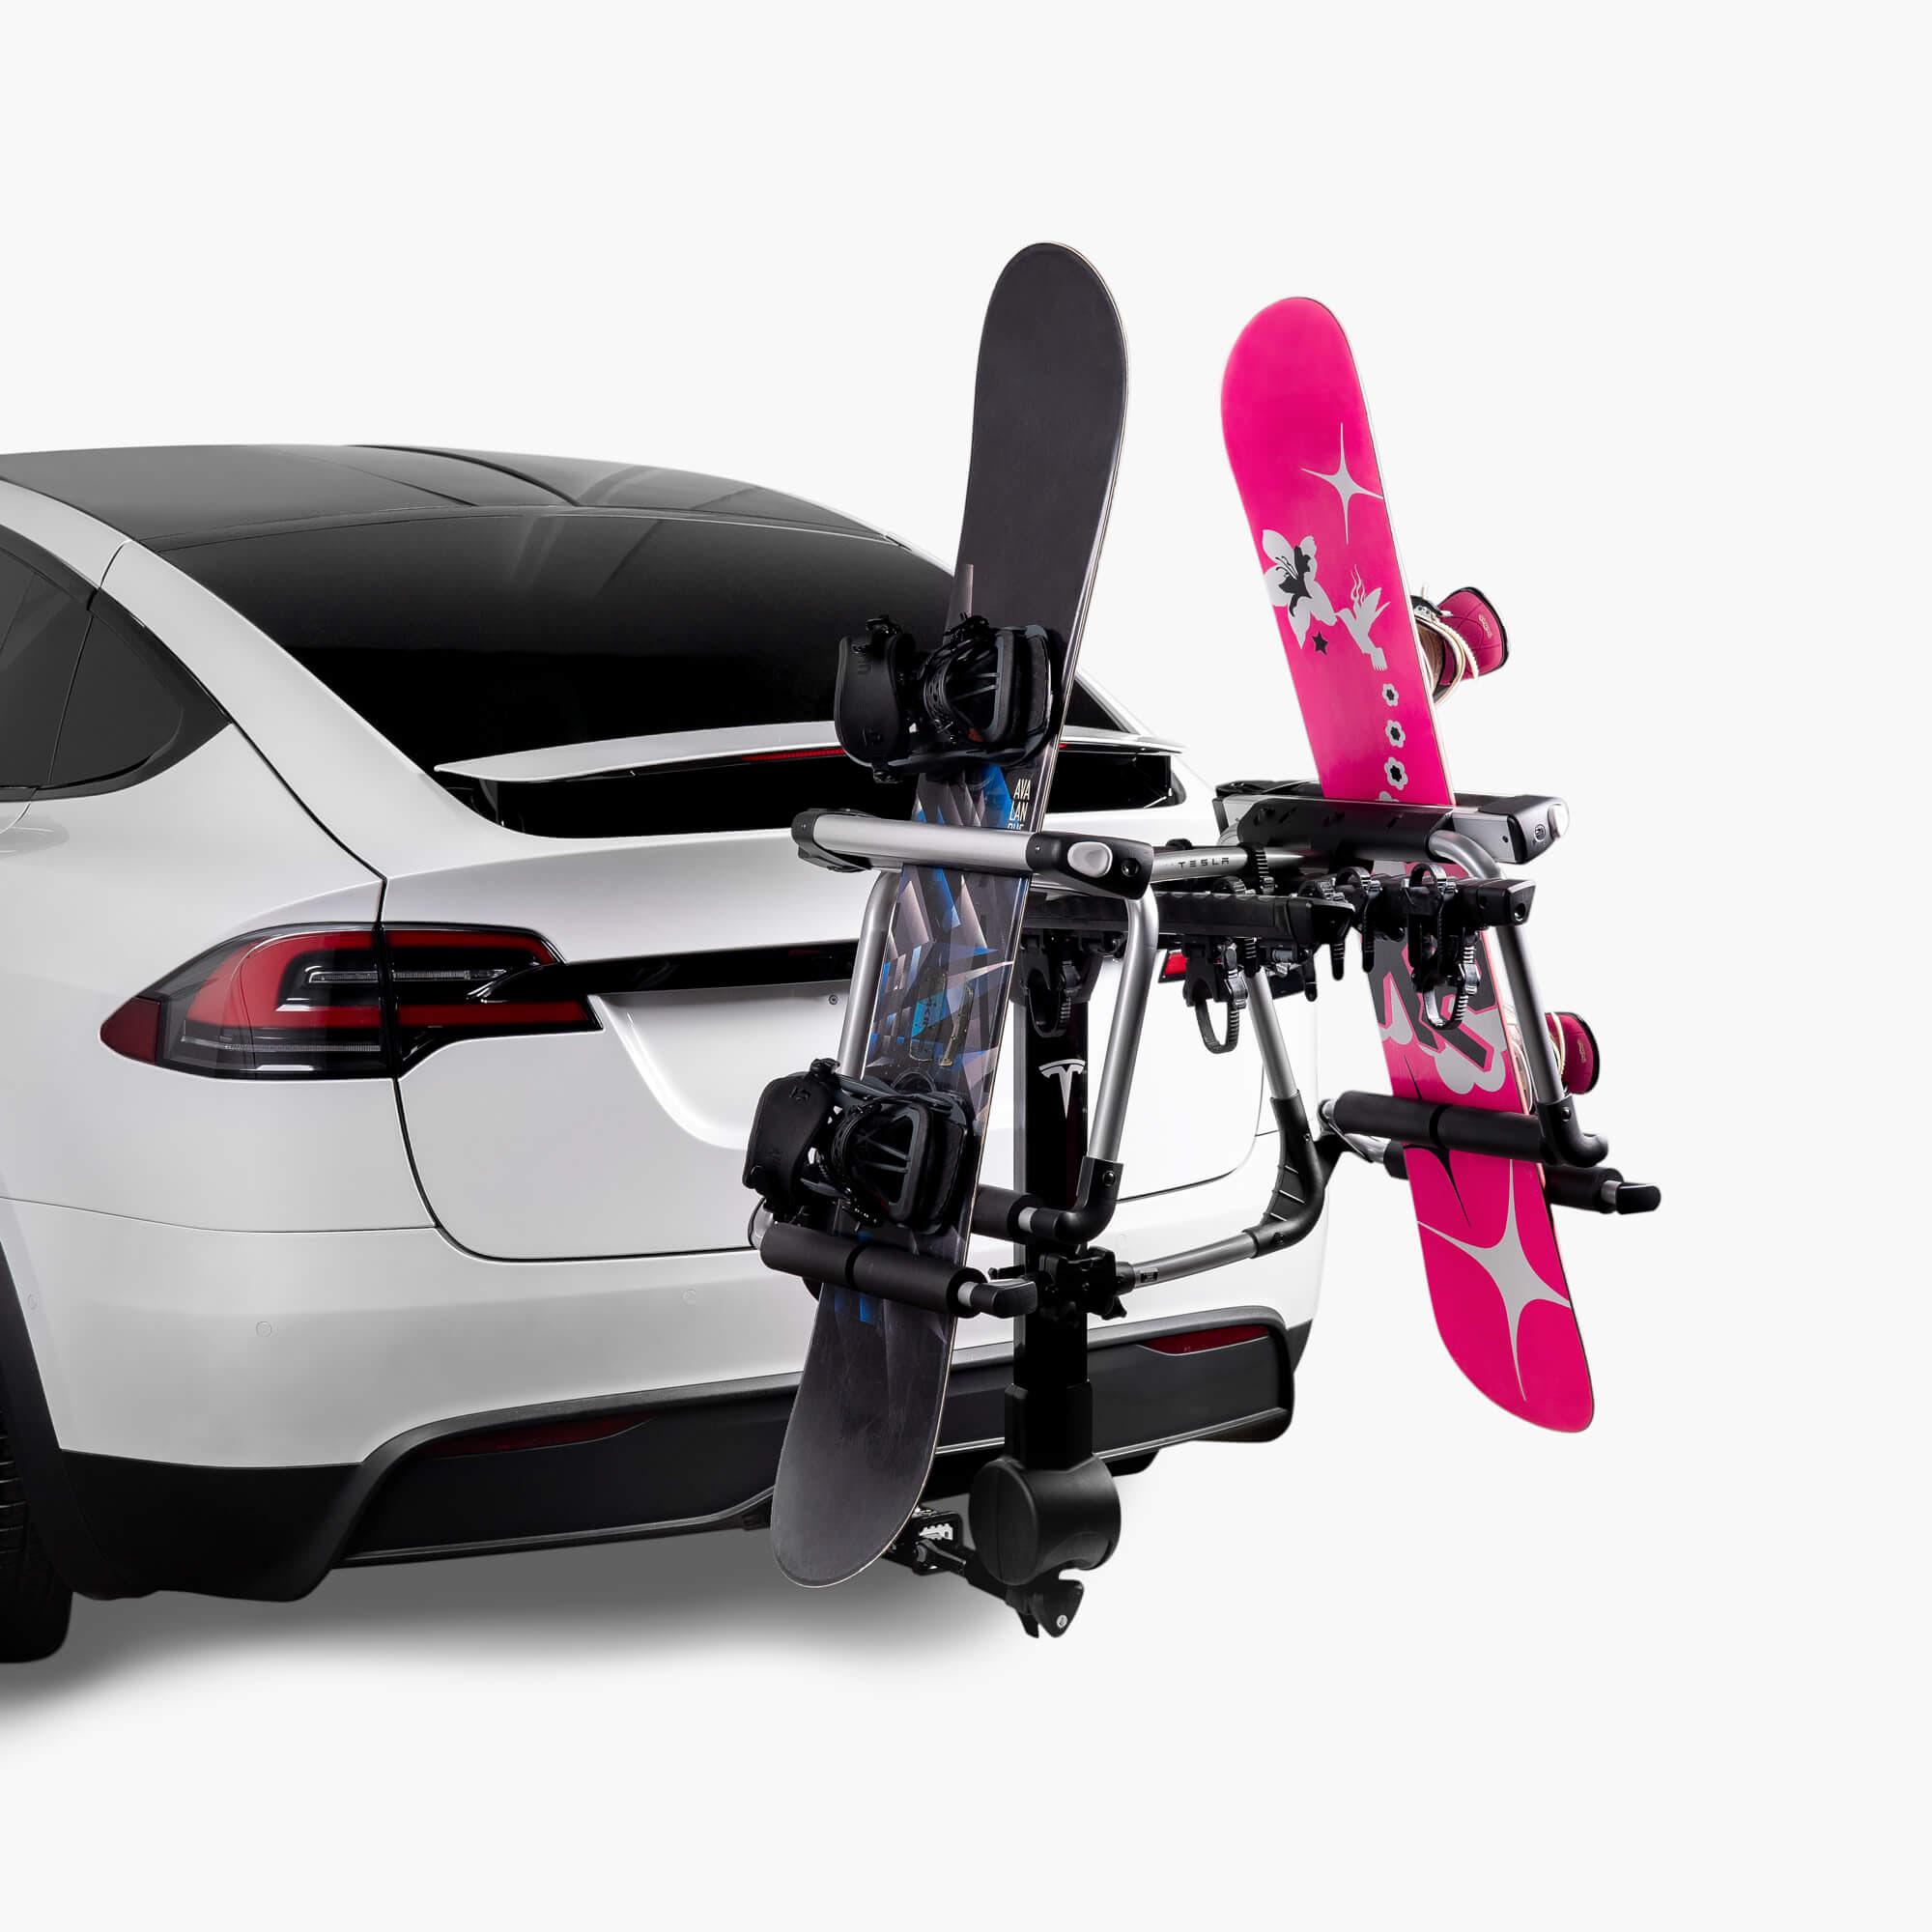 Model X Ski Snowboard Carrier For Hitch Rack